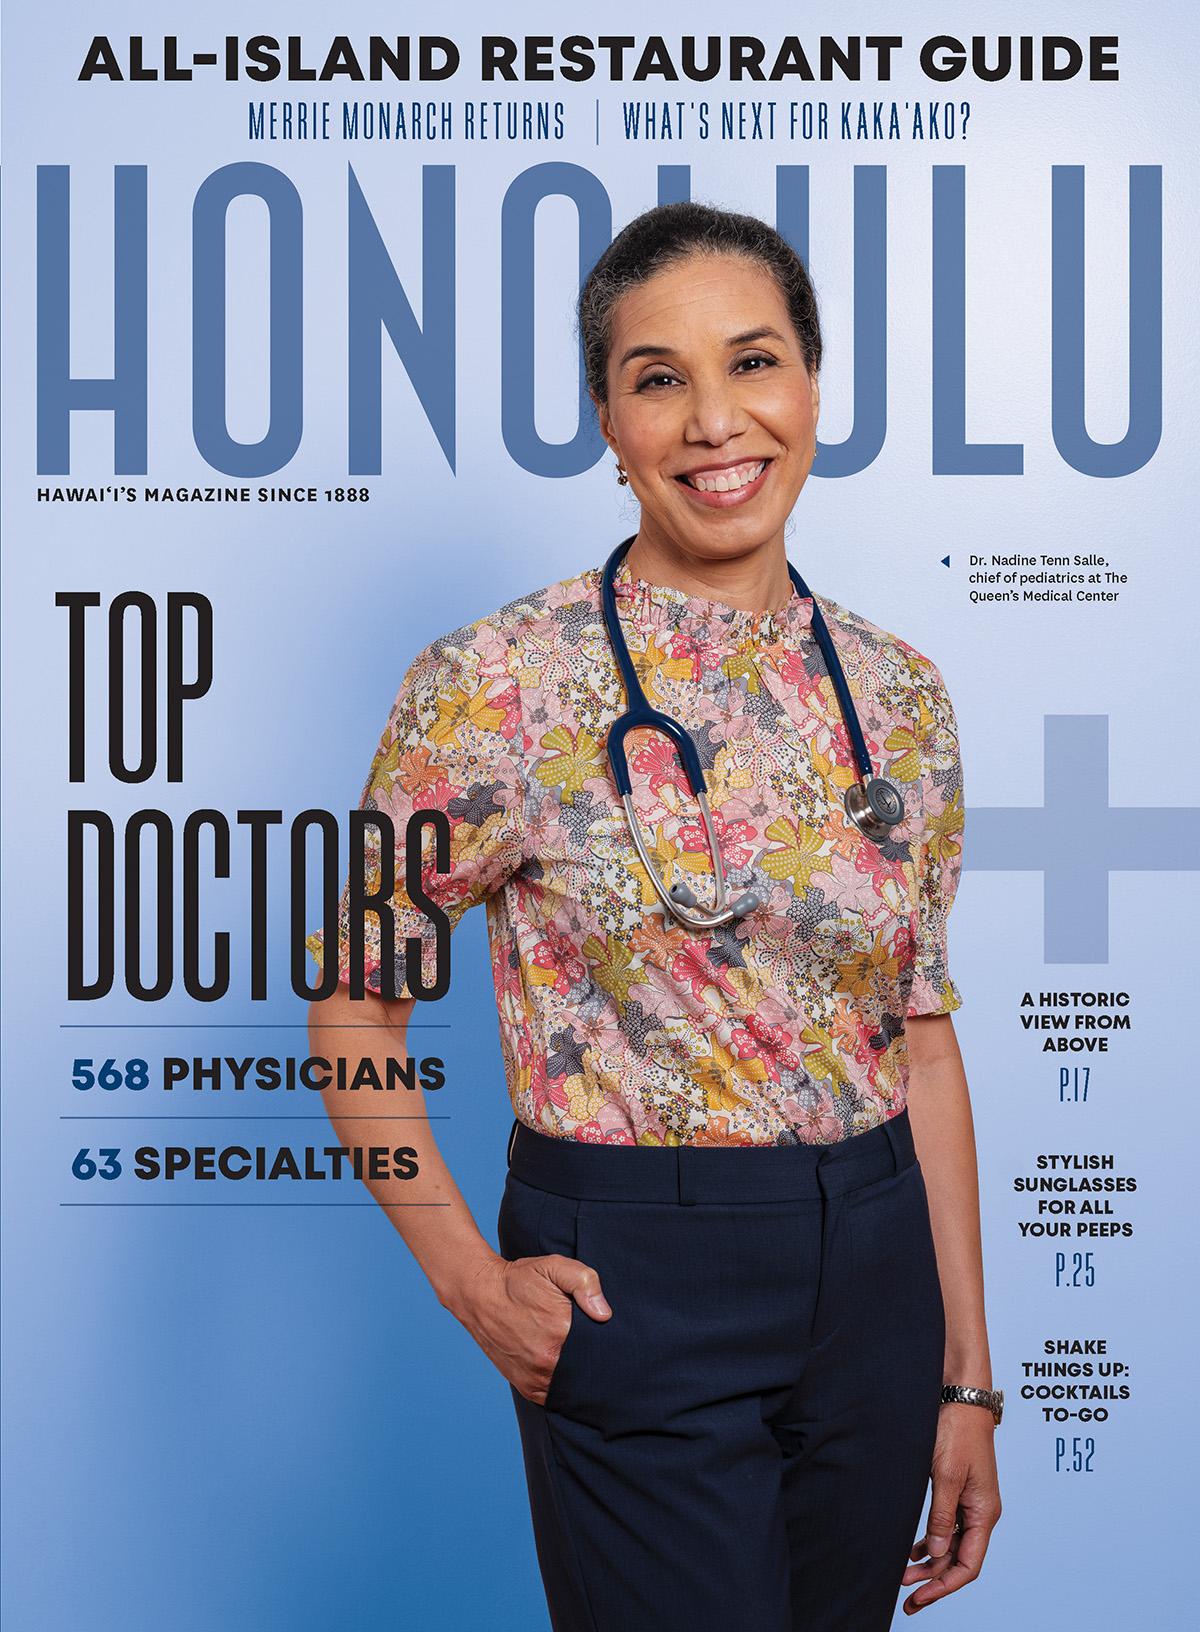 06 21 Hn Cover Top Doctors Sans Barcode